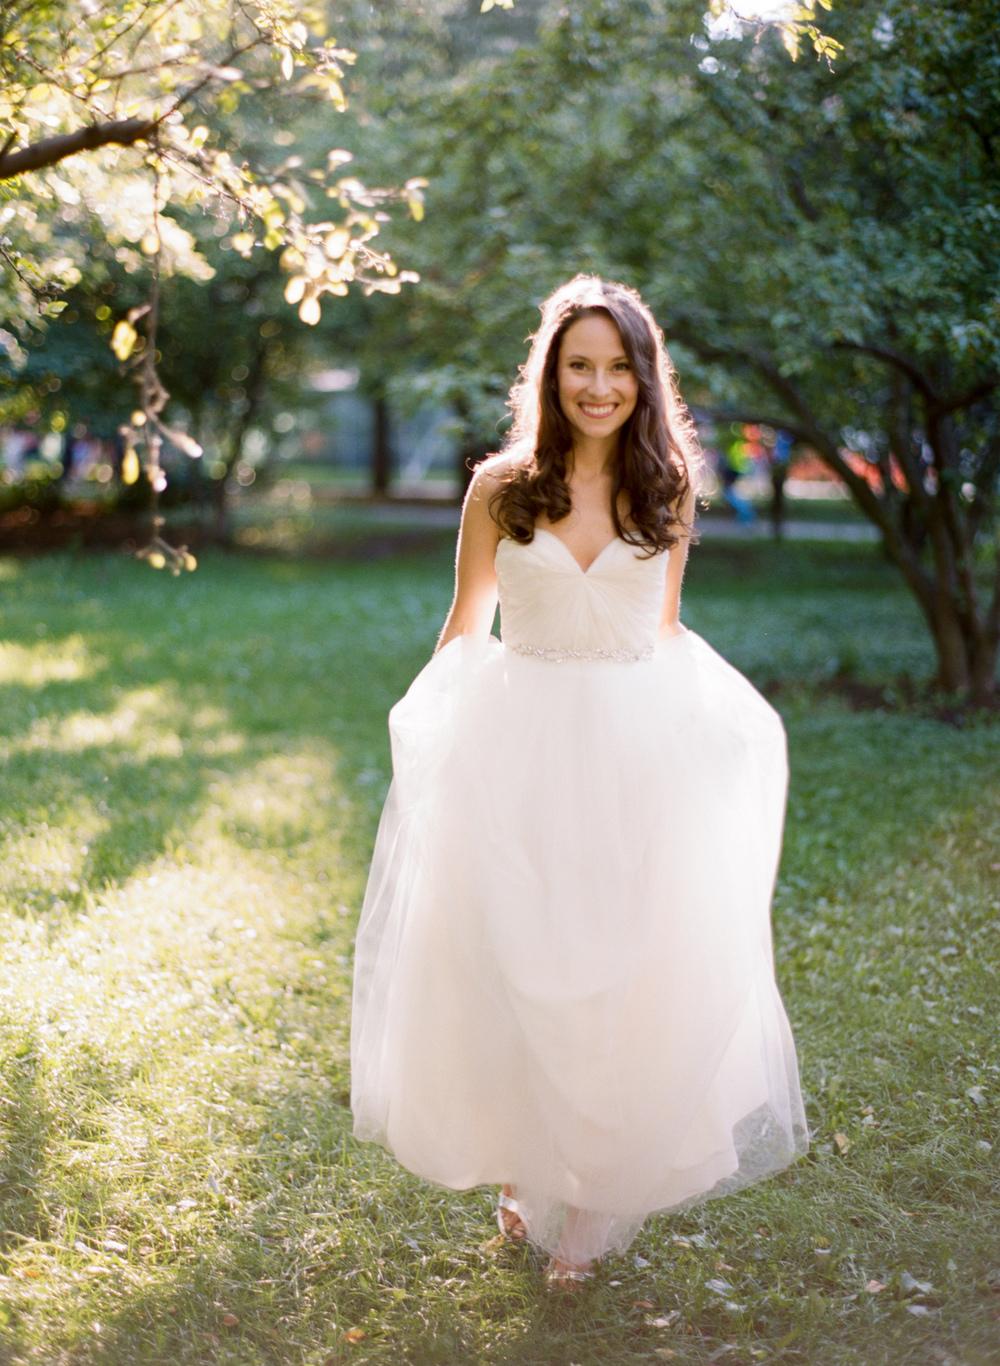 levine_wedding-0185.jpg